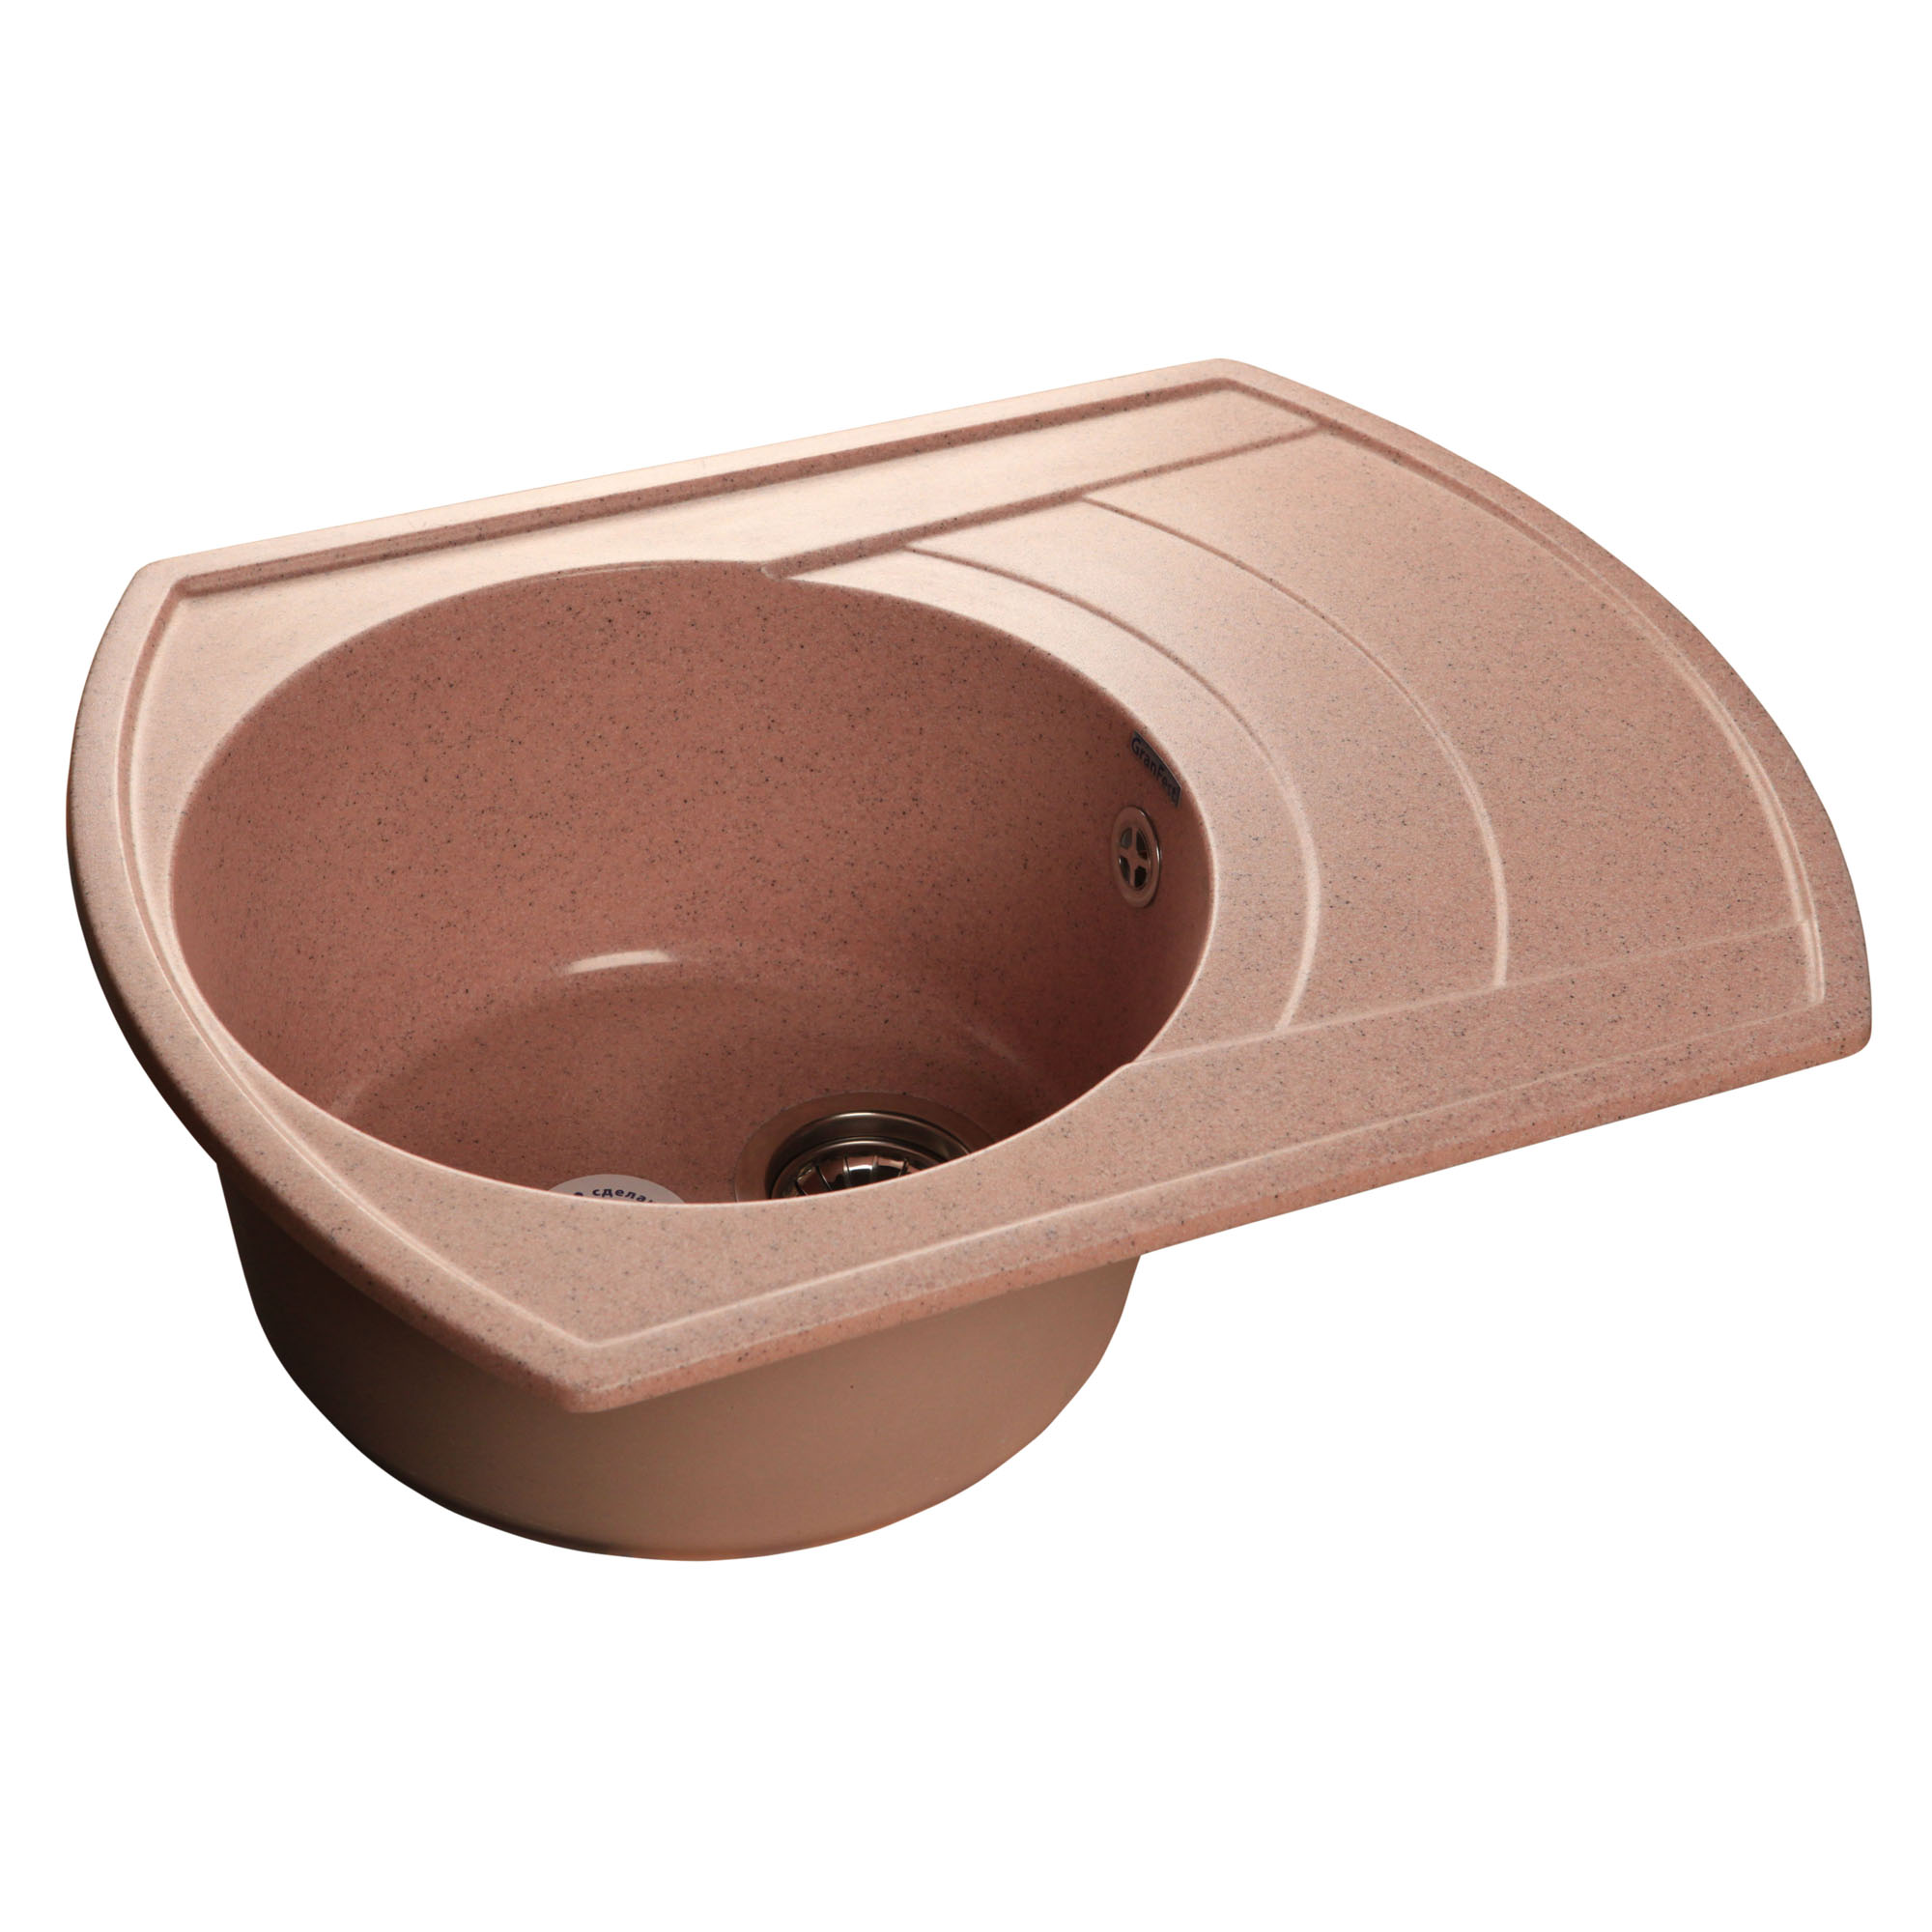 Кухонная мойка GranFest Rondo GF-R650L розовый мойка кухонная granfest гранит 650x500 чаша крыло gf r650l черная